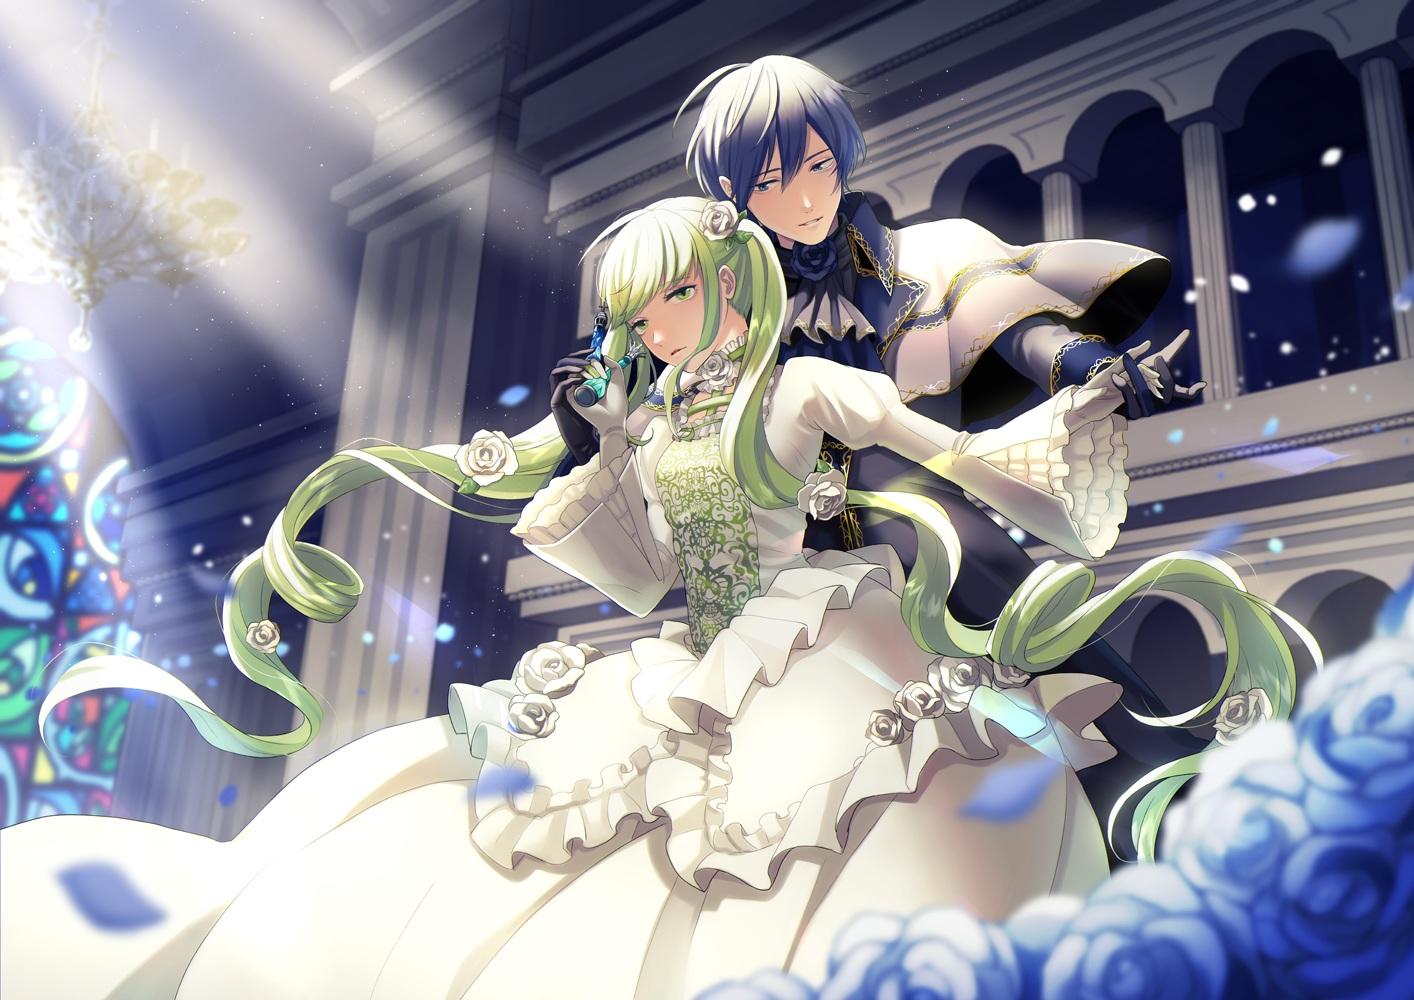 blue_eyes blue_hair building cantarella_(vocaloid) dress flowers gloves green_eyes green_hair hatsune_miku kaito male nokuhashi petals rose vocaloid